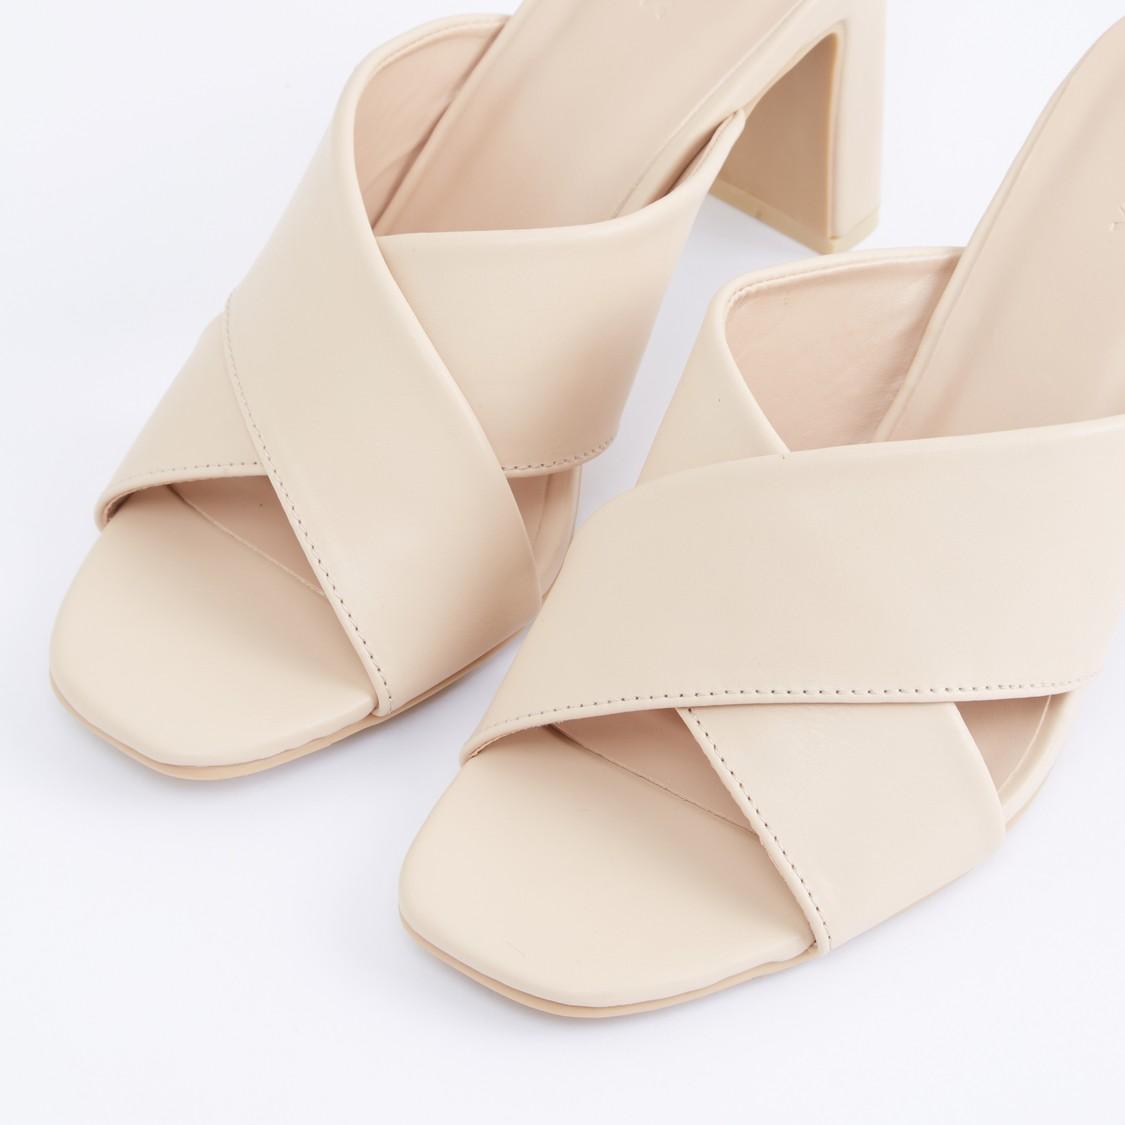 Dual Strap Slip-On Sandals